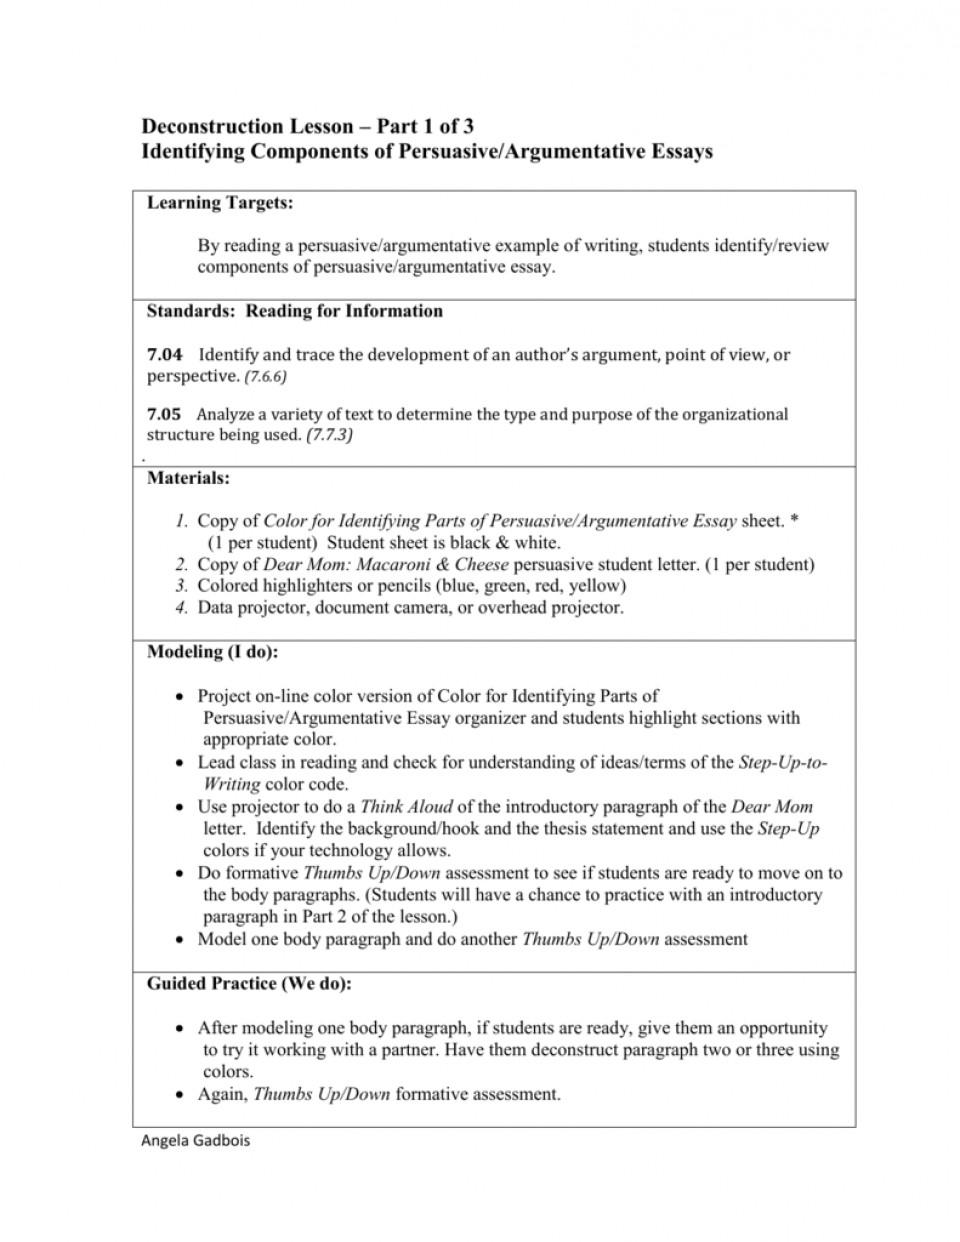 008 Essay Example 008053854 1 Parts Of Imposing 6 A Persuasive 960